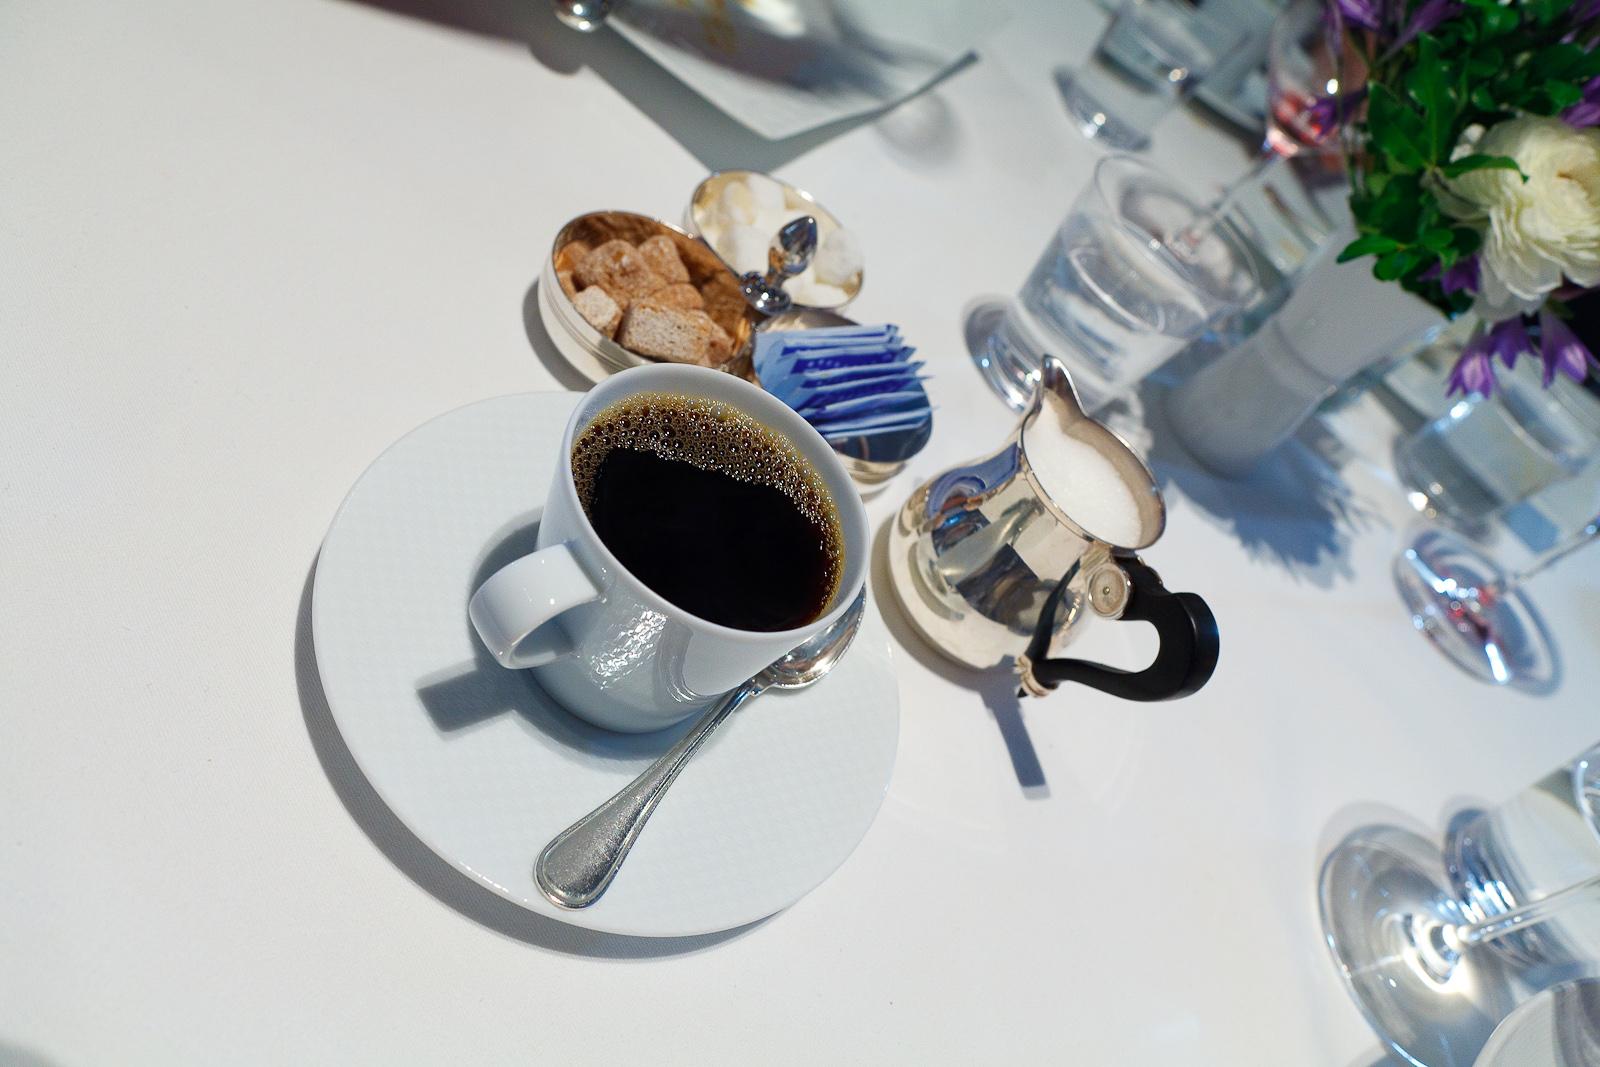 Black coffee, cream, and sugar